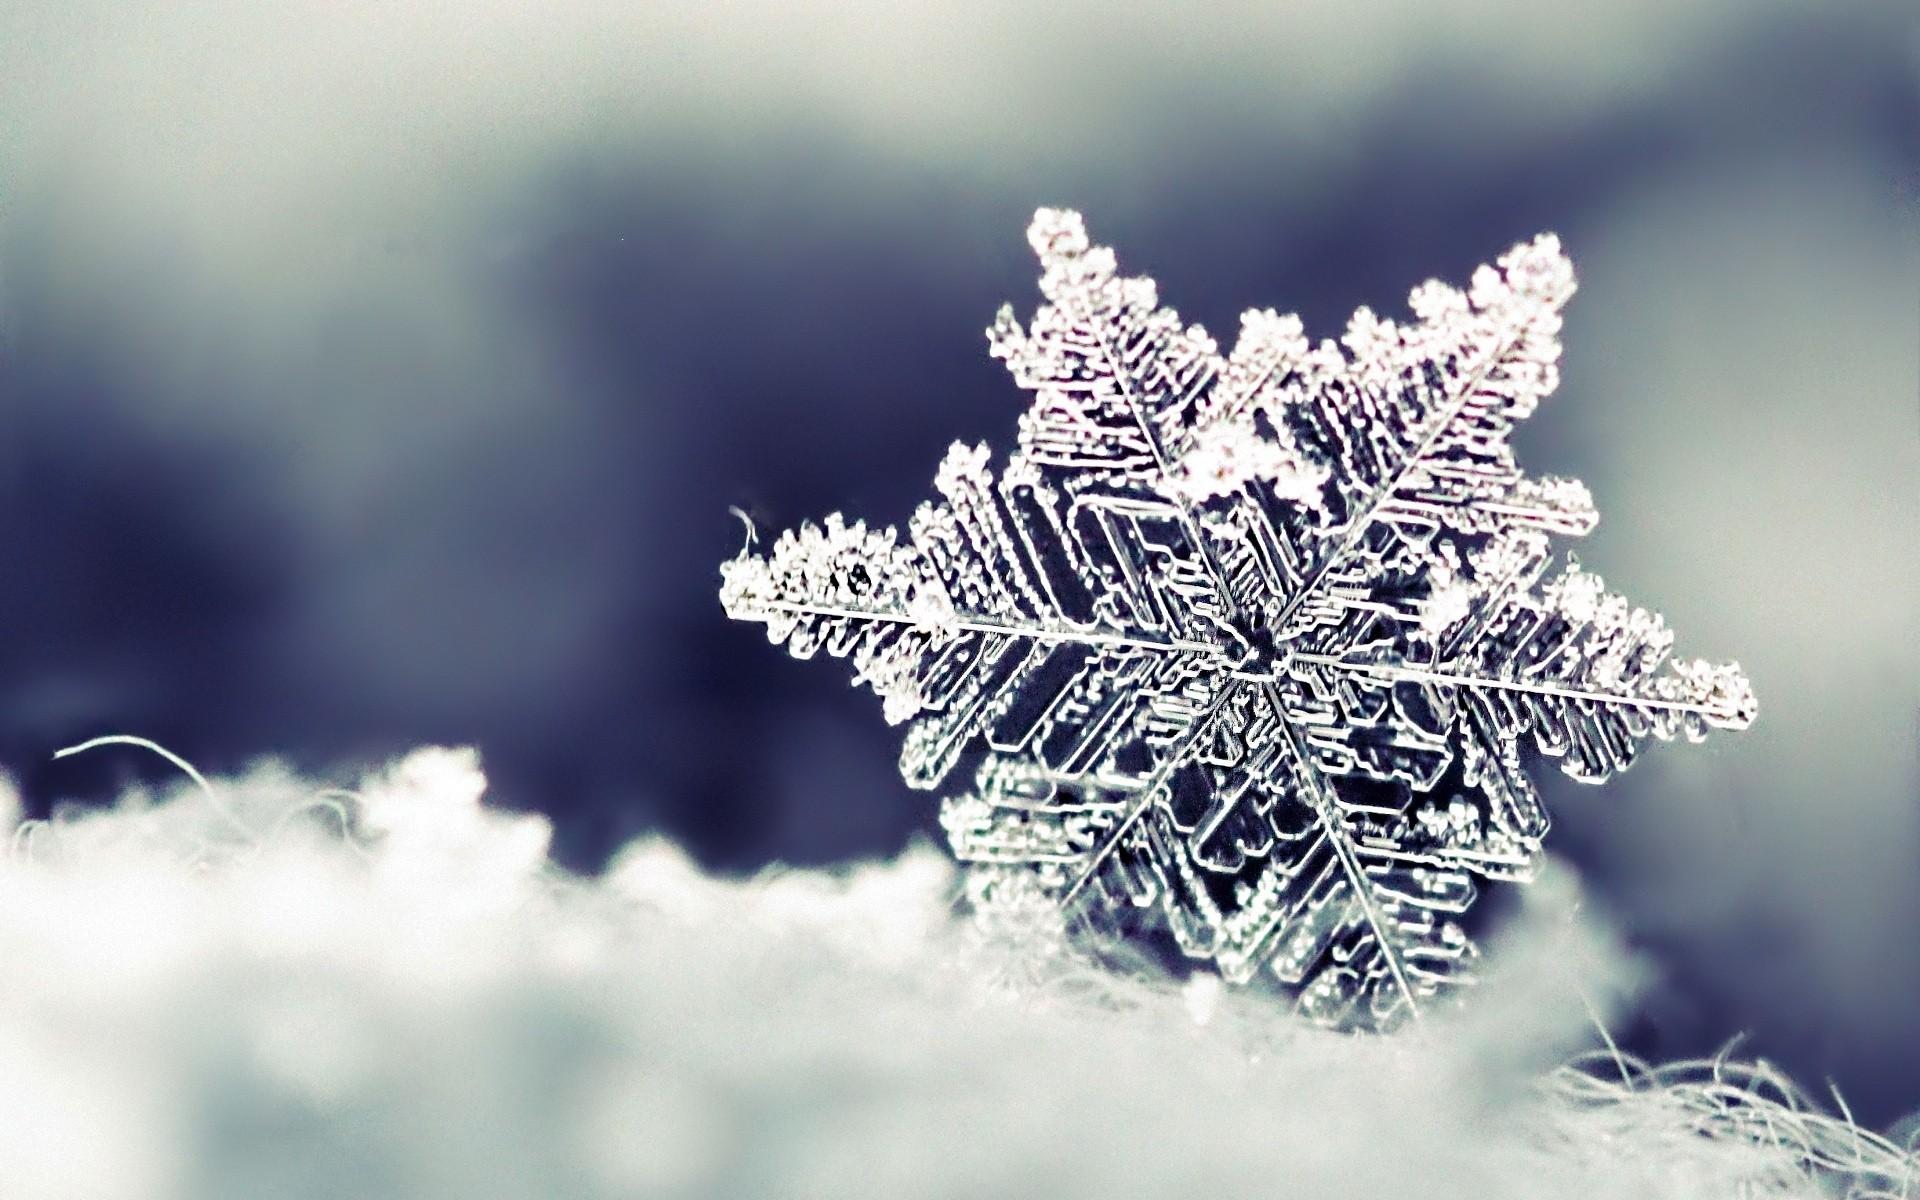 Storia di un fiocco di neve